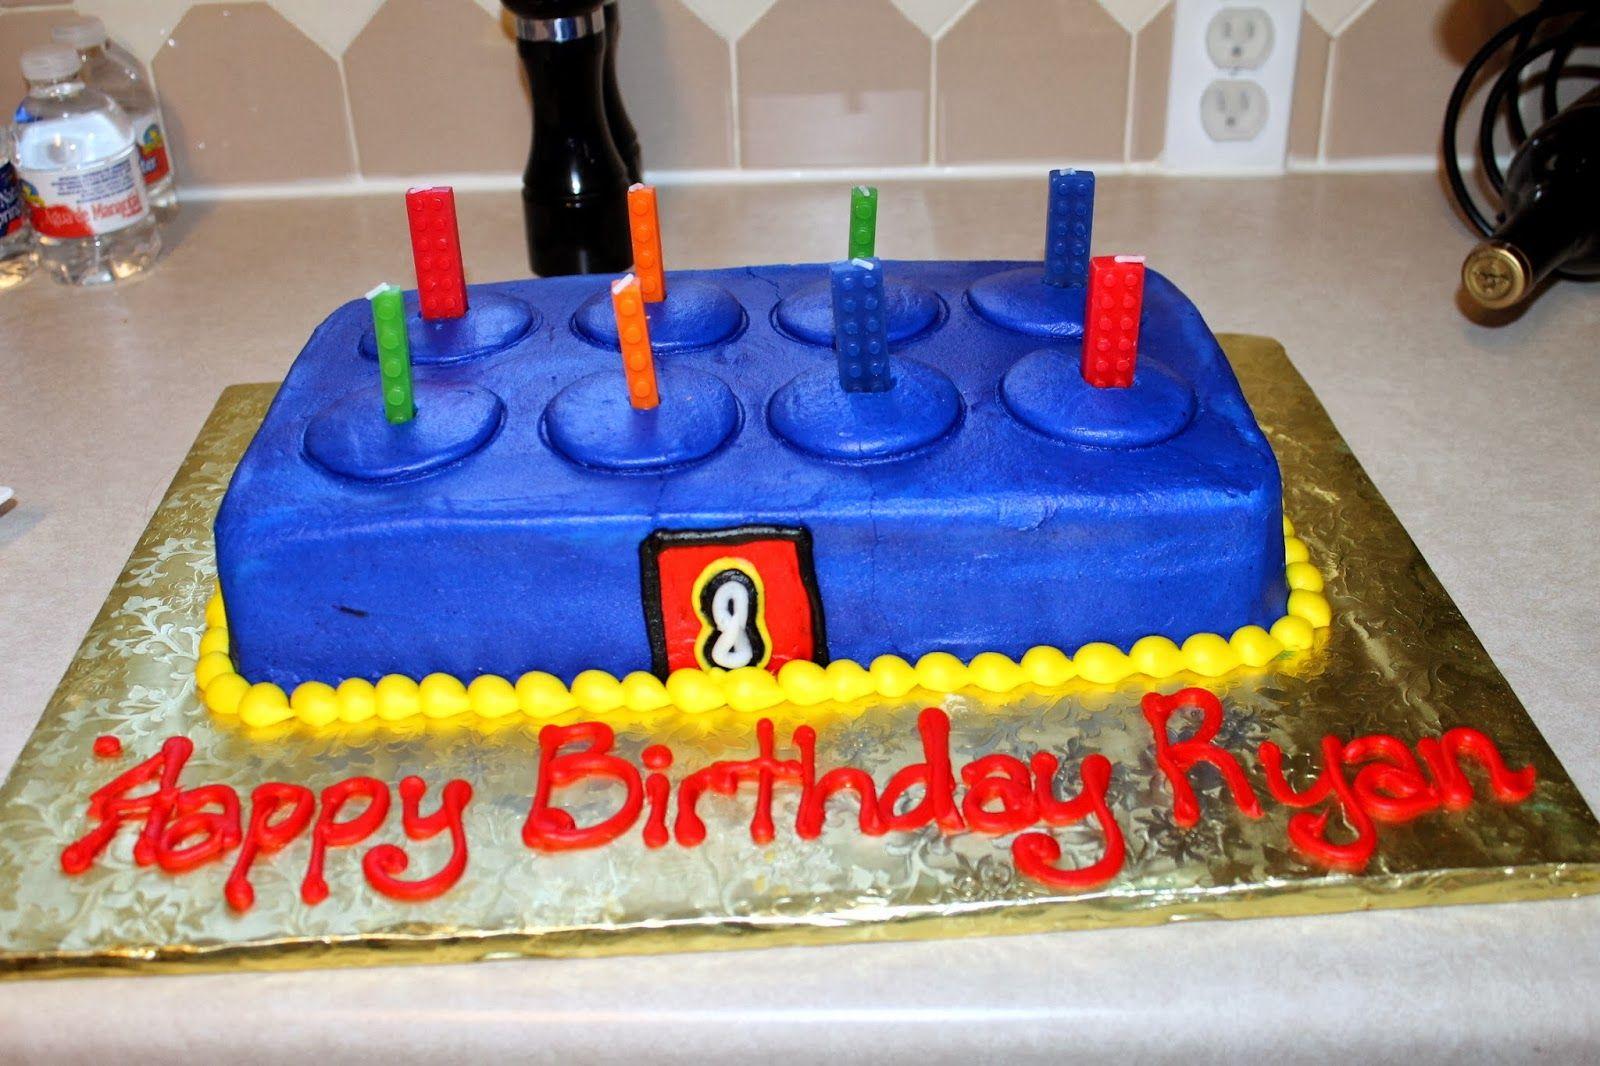 Birthday Cake Ideas Lego ~ Lego movie birthday lego brick cake from our favorite bakery